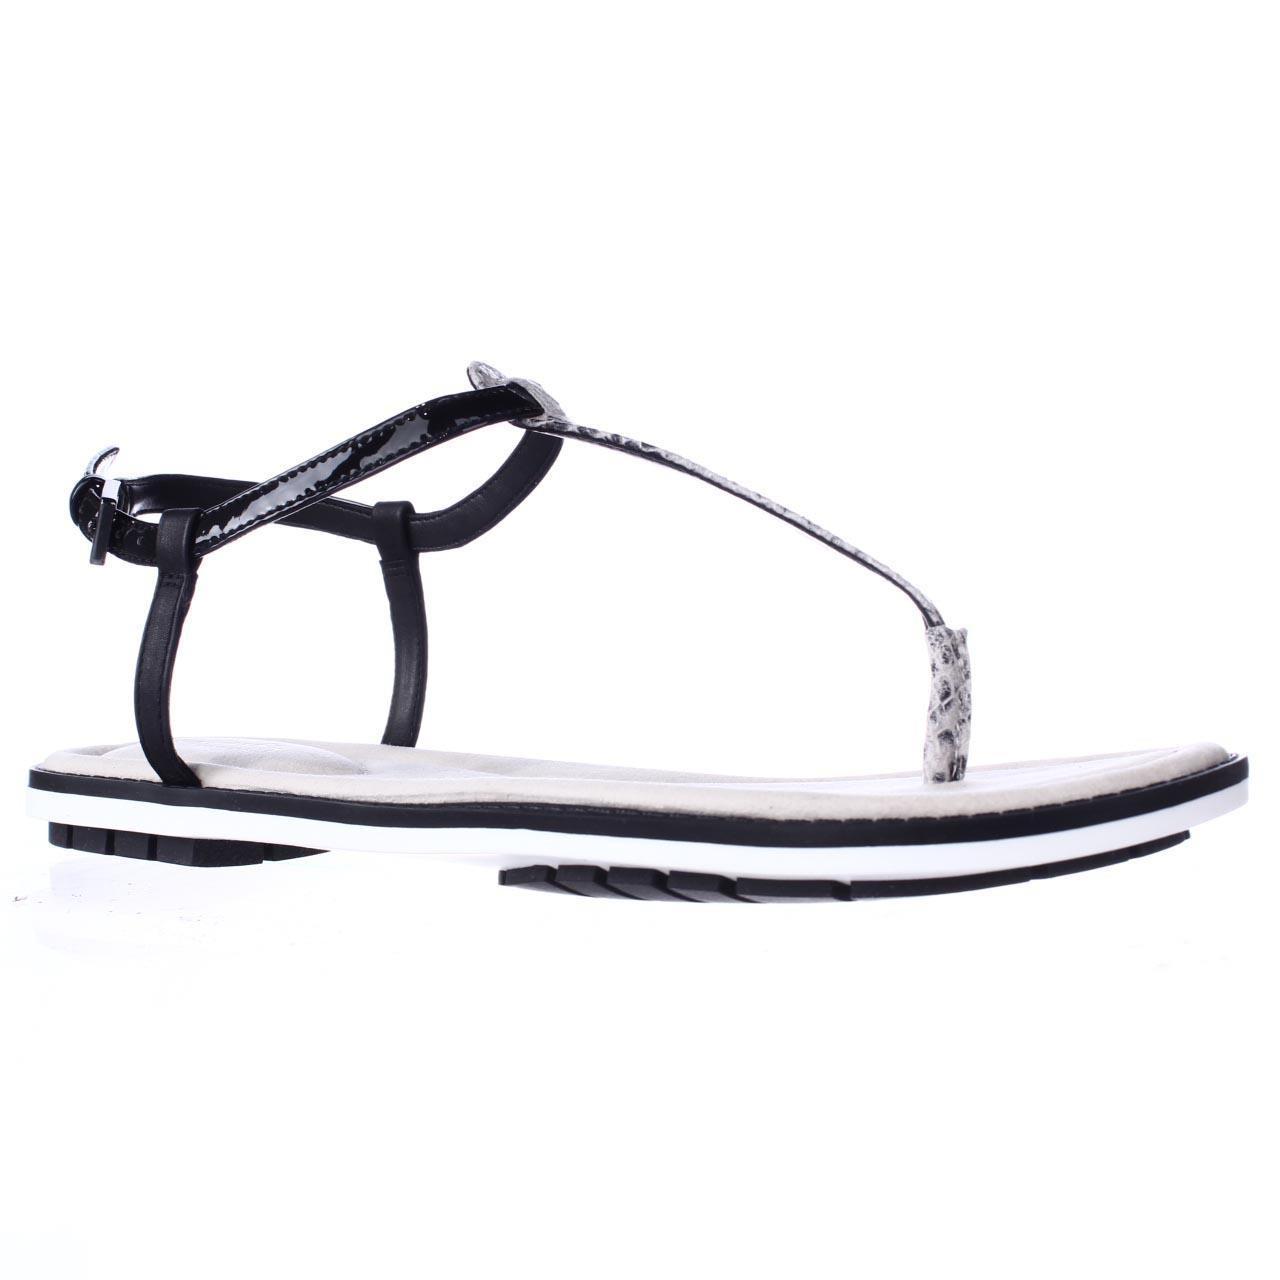 0b6bcd27383 Lyst - Clarks Seattle Spice T-strap Flat Sandals - Black Snake in Black